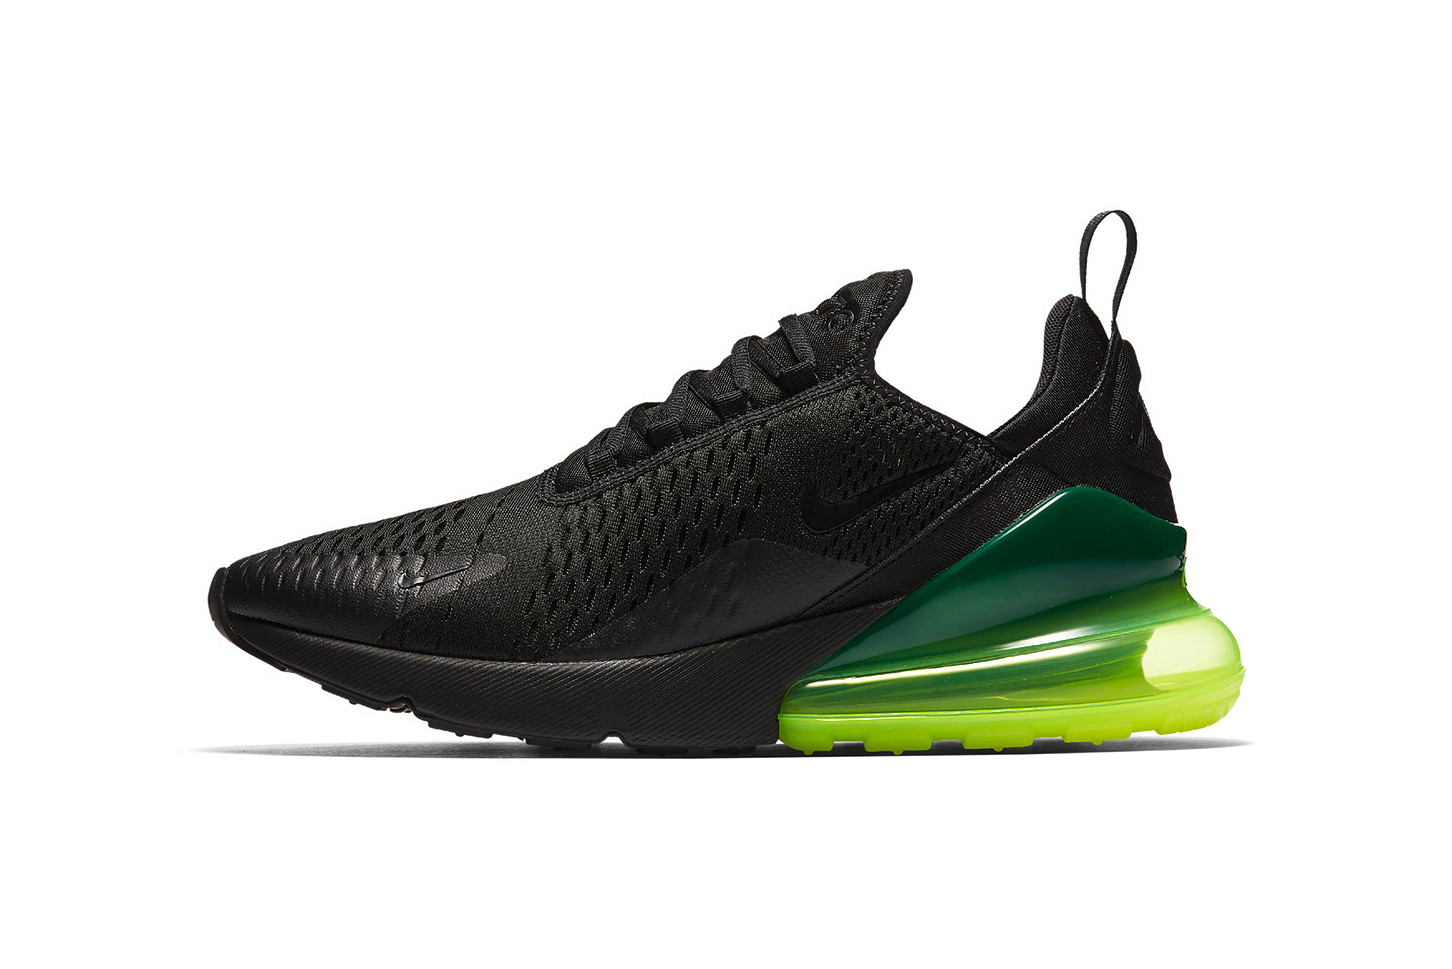 Nike Air Max 270 in Black/Neon Green